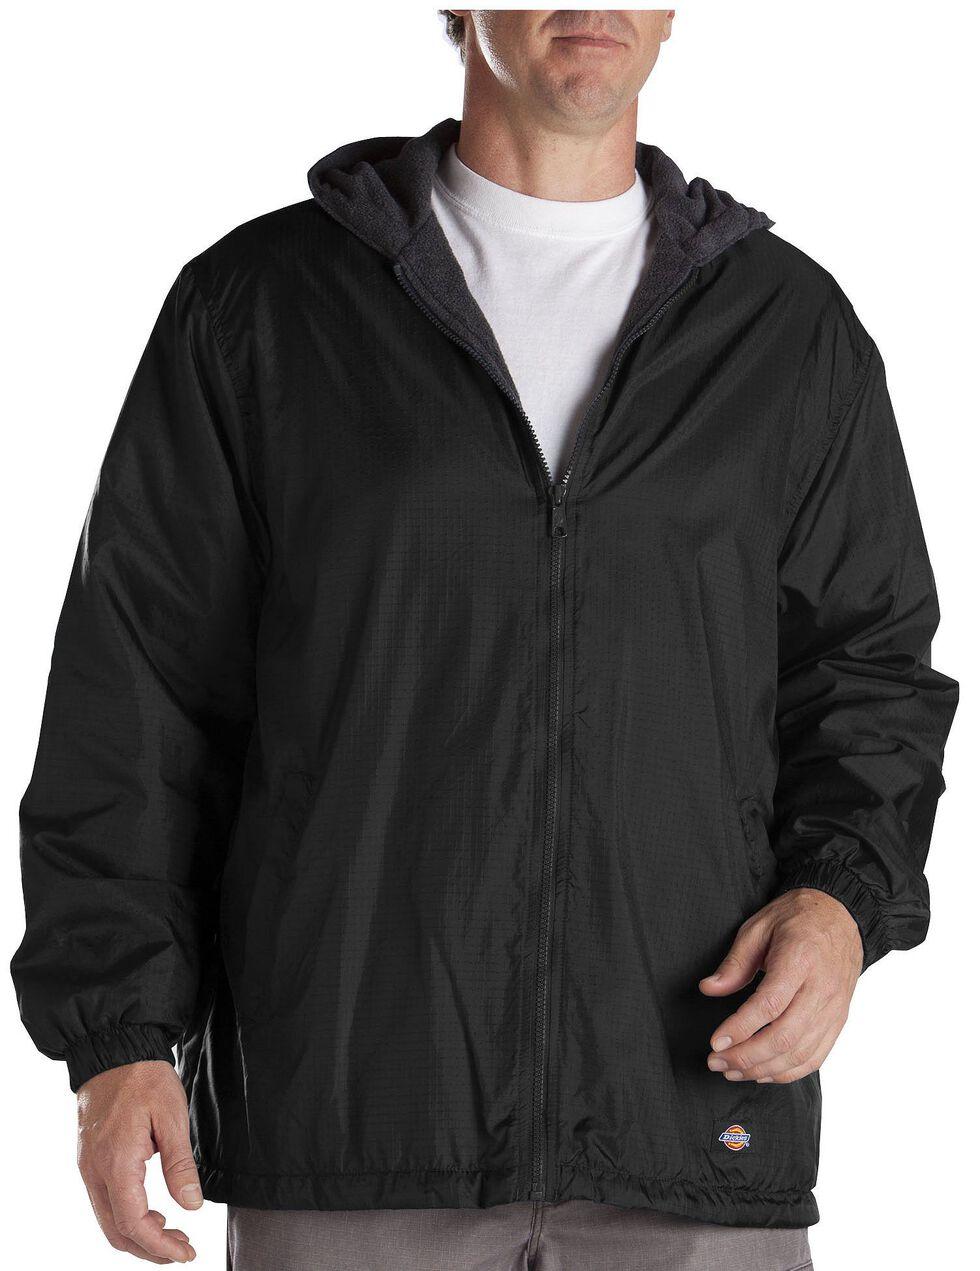 Dickies Fleece Lined Hooded Jacket - Big & Tall, Black, hi-res